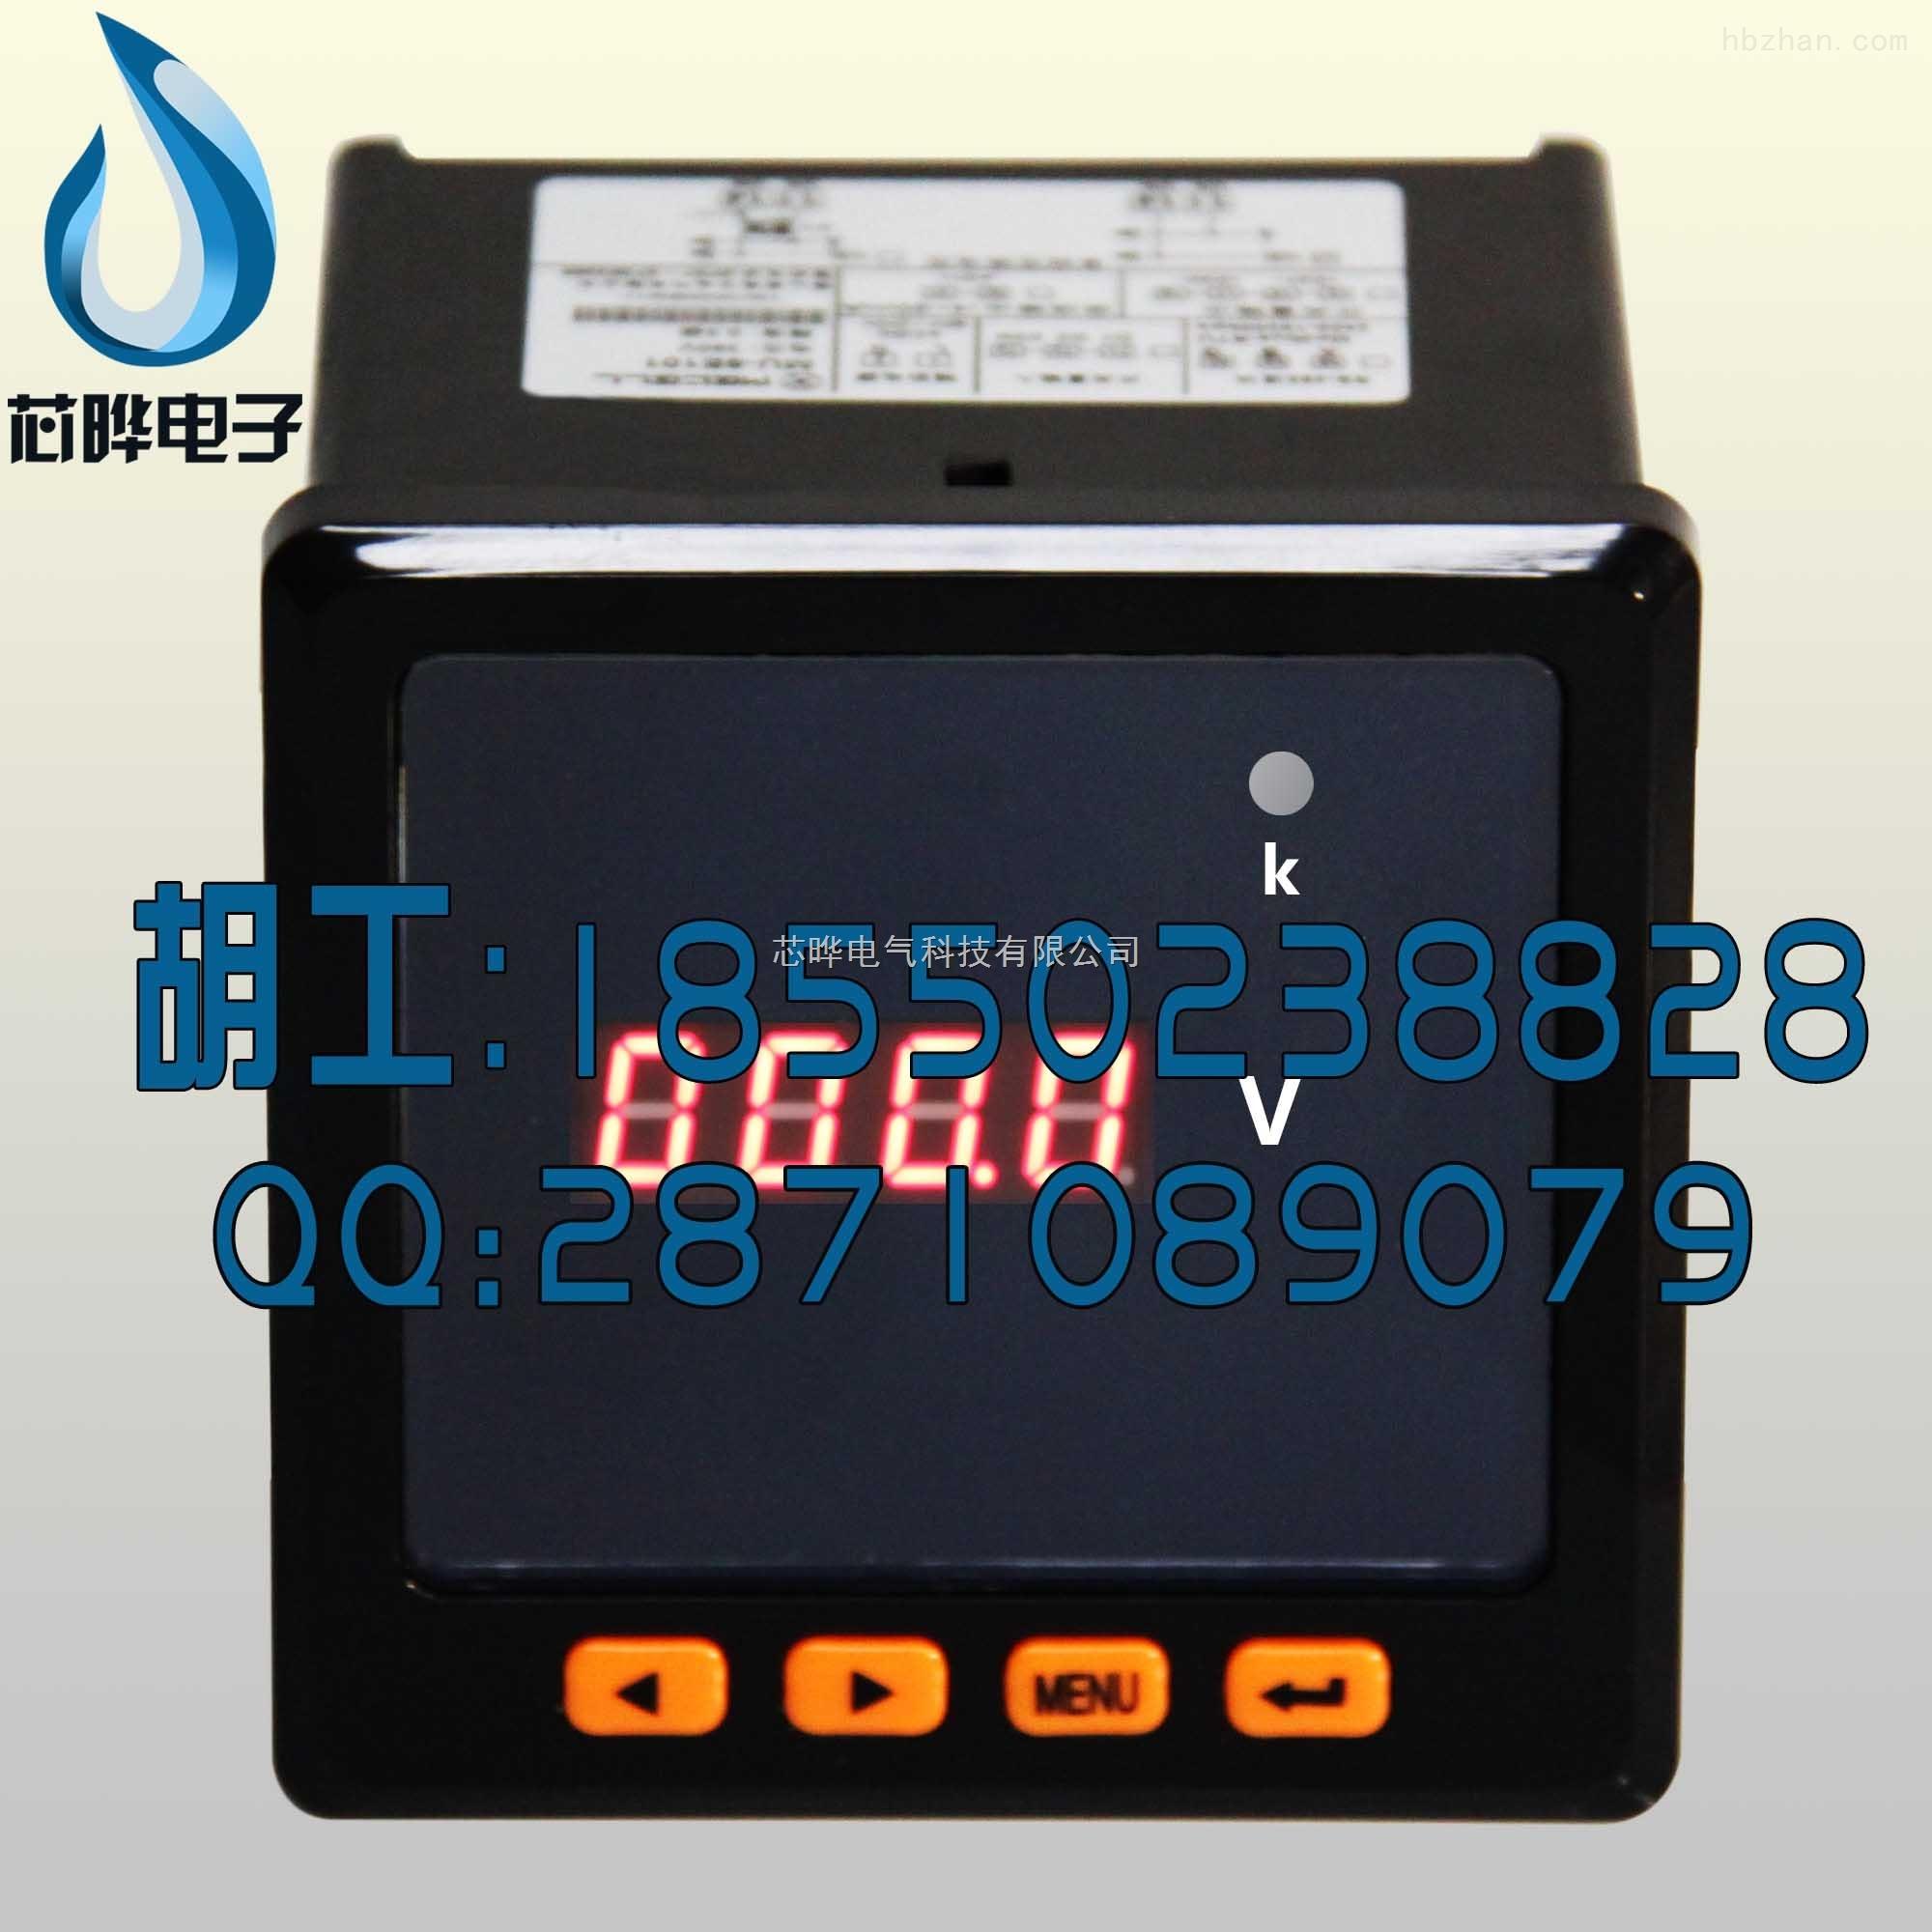 ca6c-v-ca6c-v直流数字电压表-芯晔电气科技有限公司